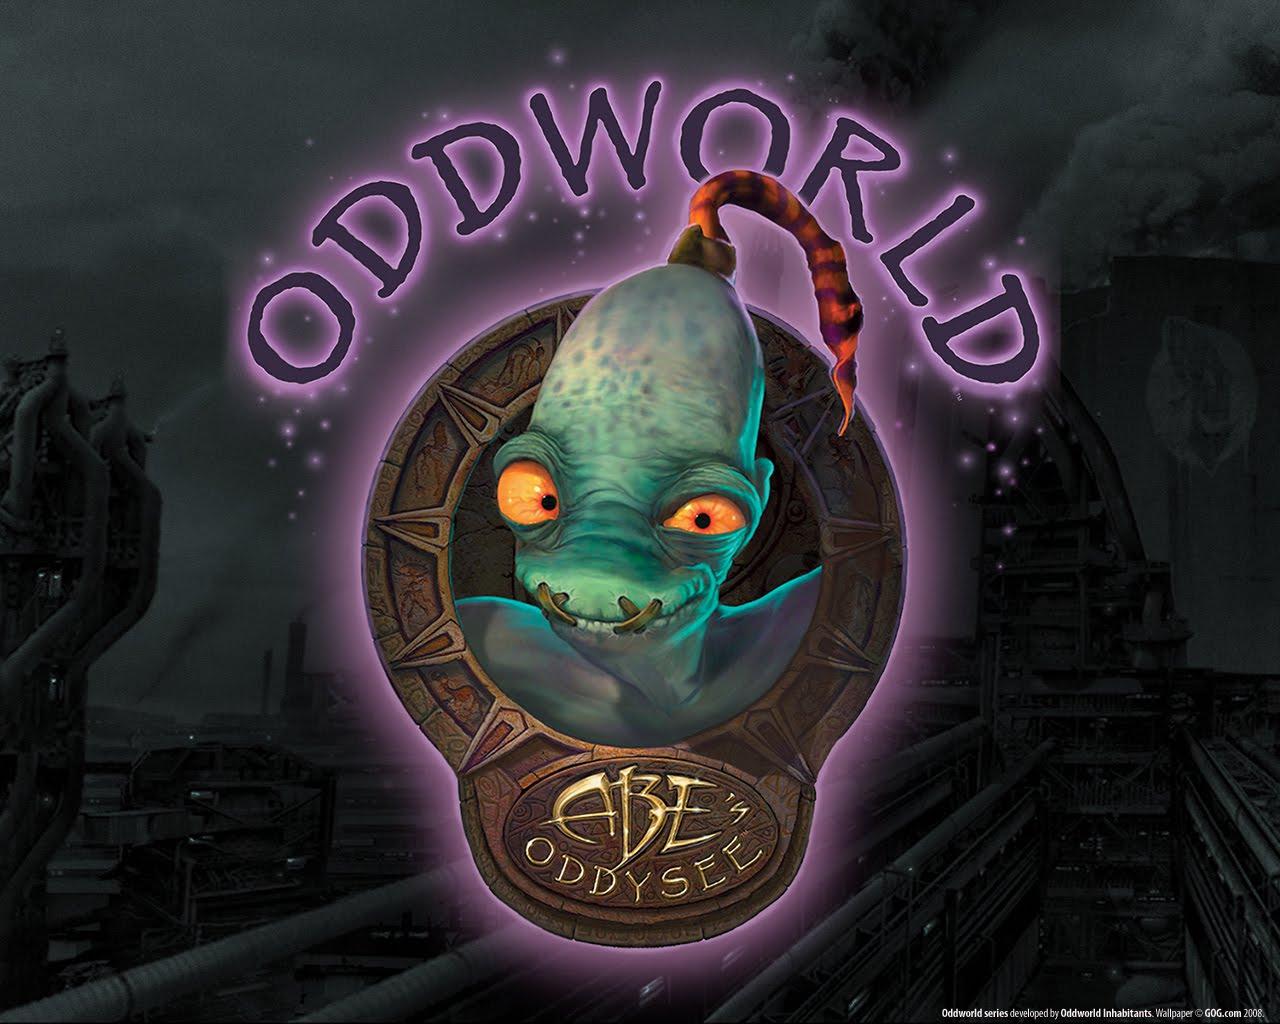 Oddworlds-Abes-Oddysee-Kapak.jpg